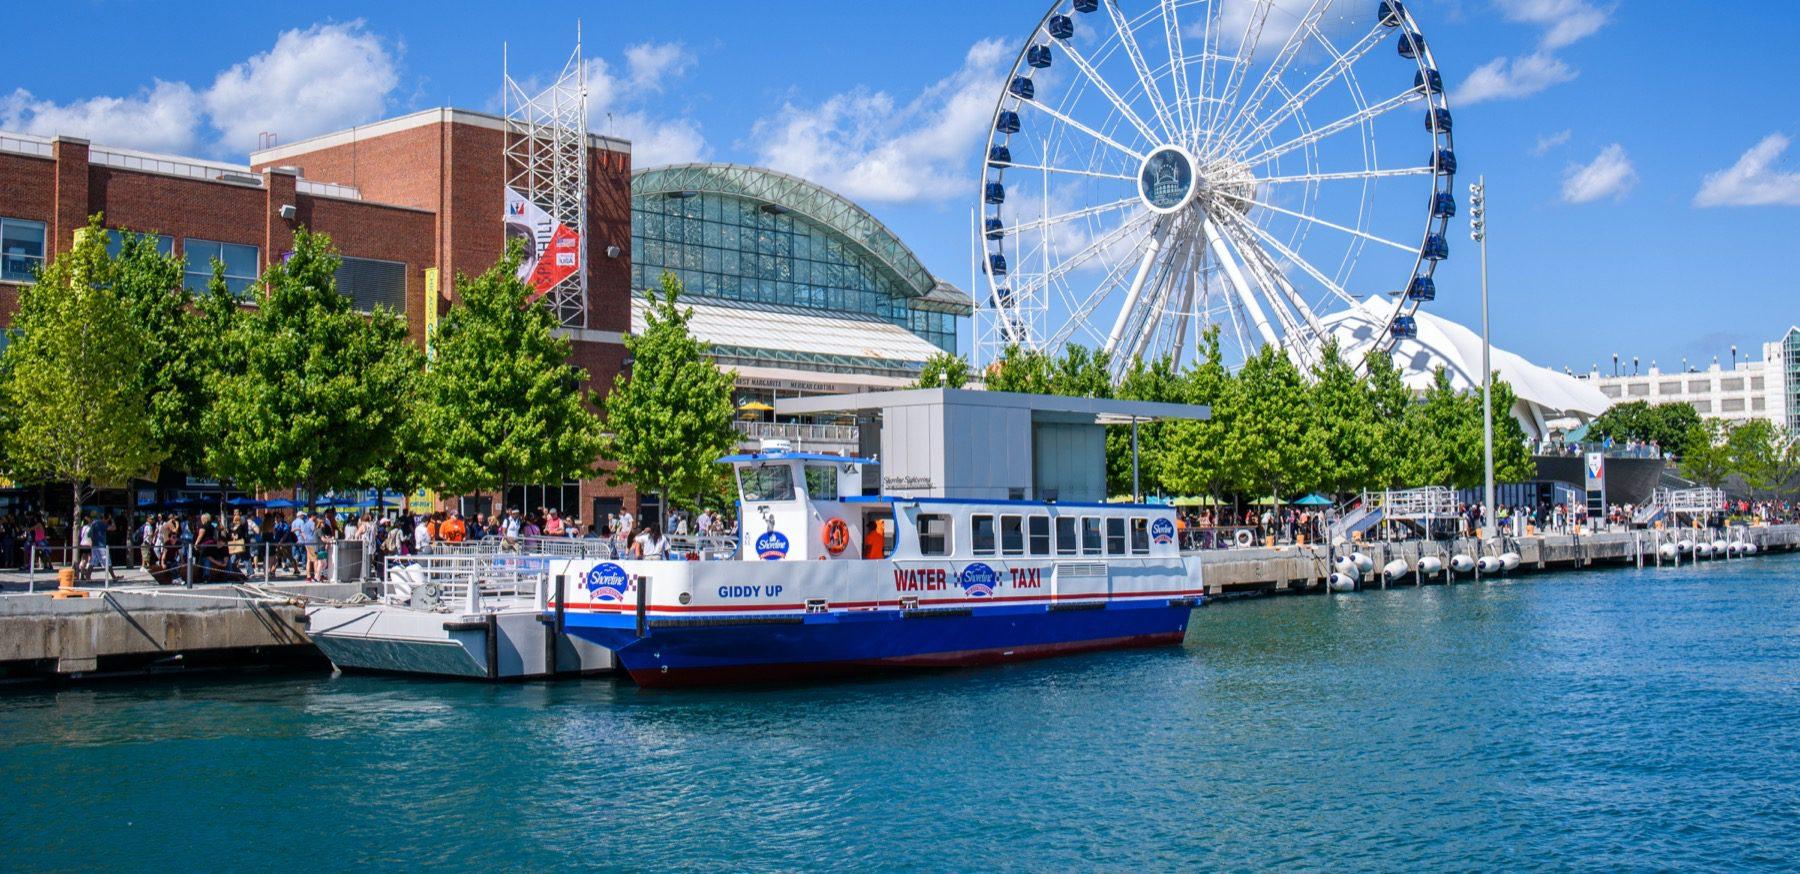 Navy Pier Chicago Limousine Service